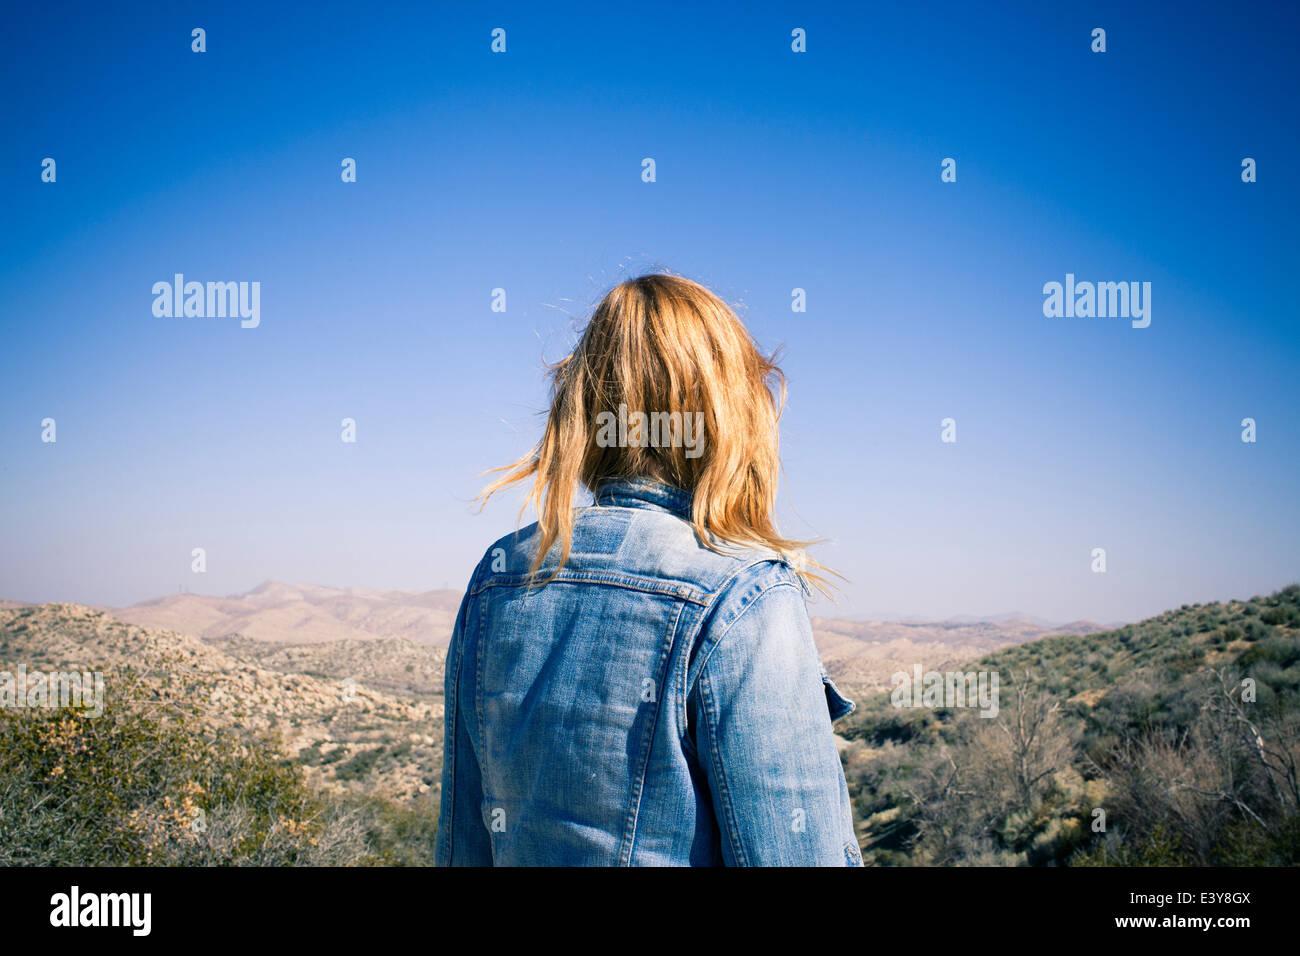 Rear view of mid adult woman gazing at view, Lake Arrowhead, California, USA Stock Photo